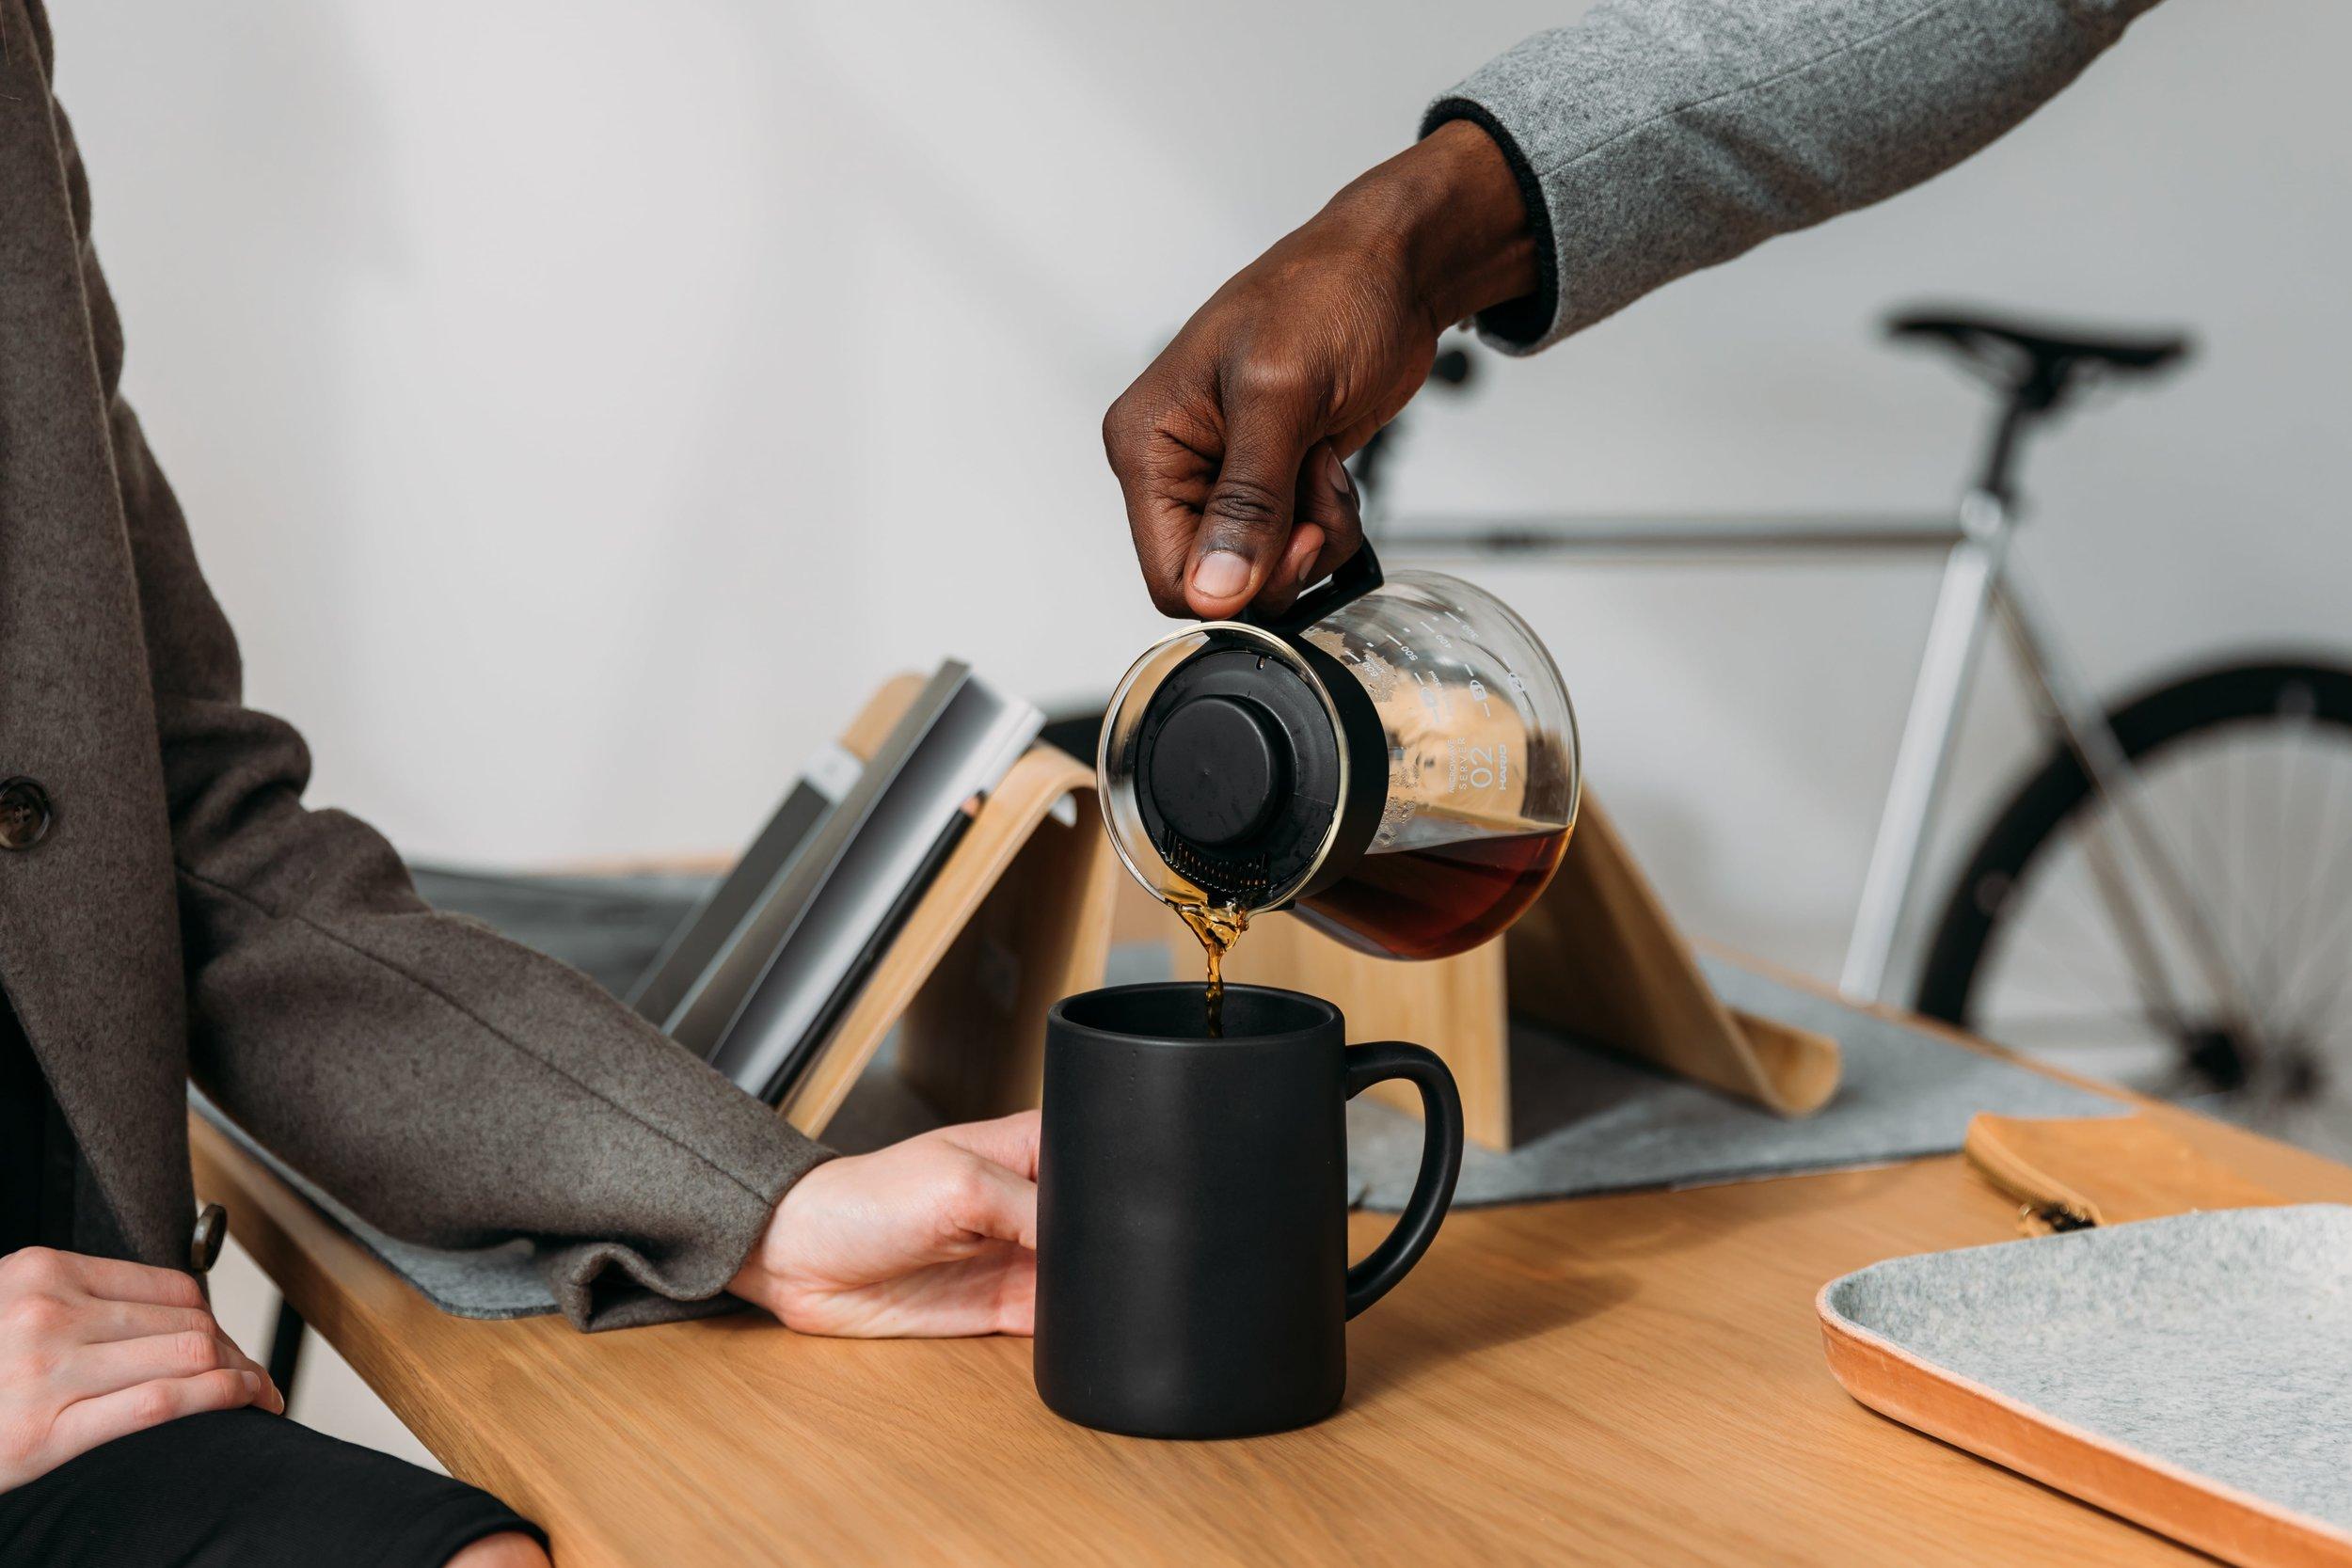 Office-Desk-Workspace-Apple-iMac-Coffee-Soho-New York-Contemporary-Minimal-Loft-Posh-Black via Death To Stock_8.jpg